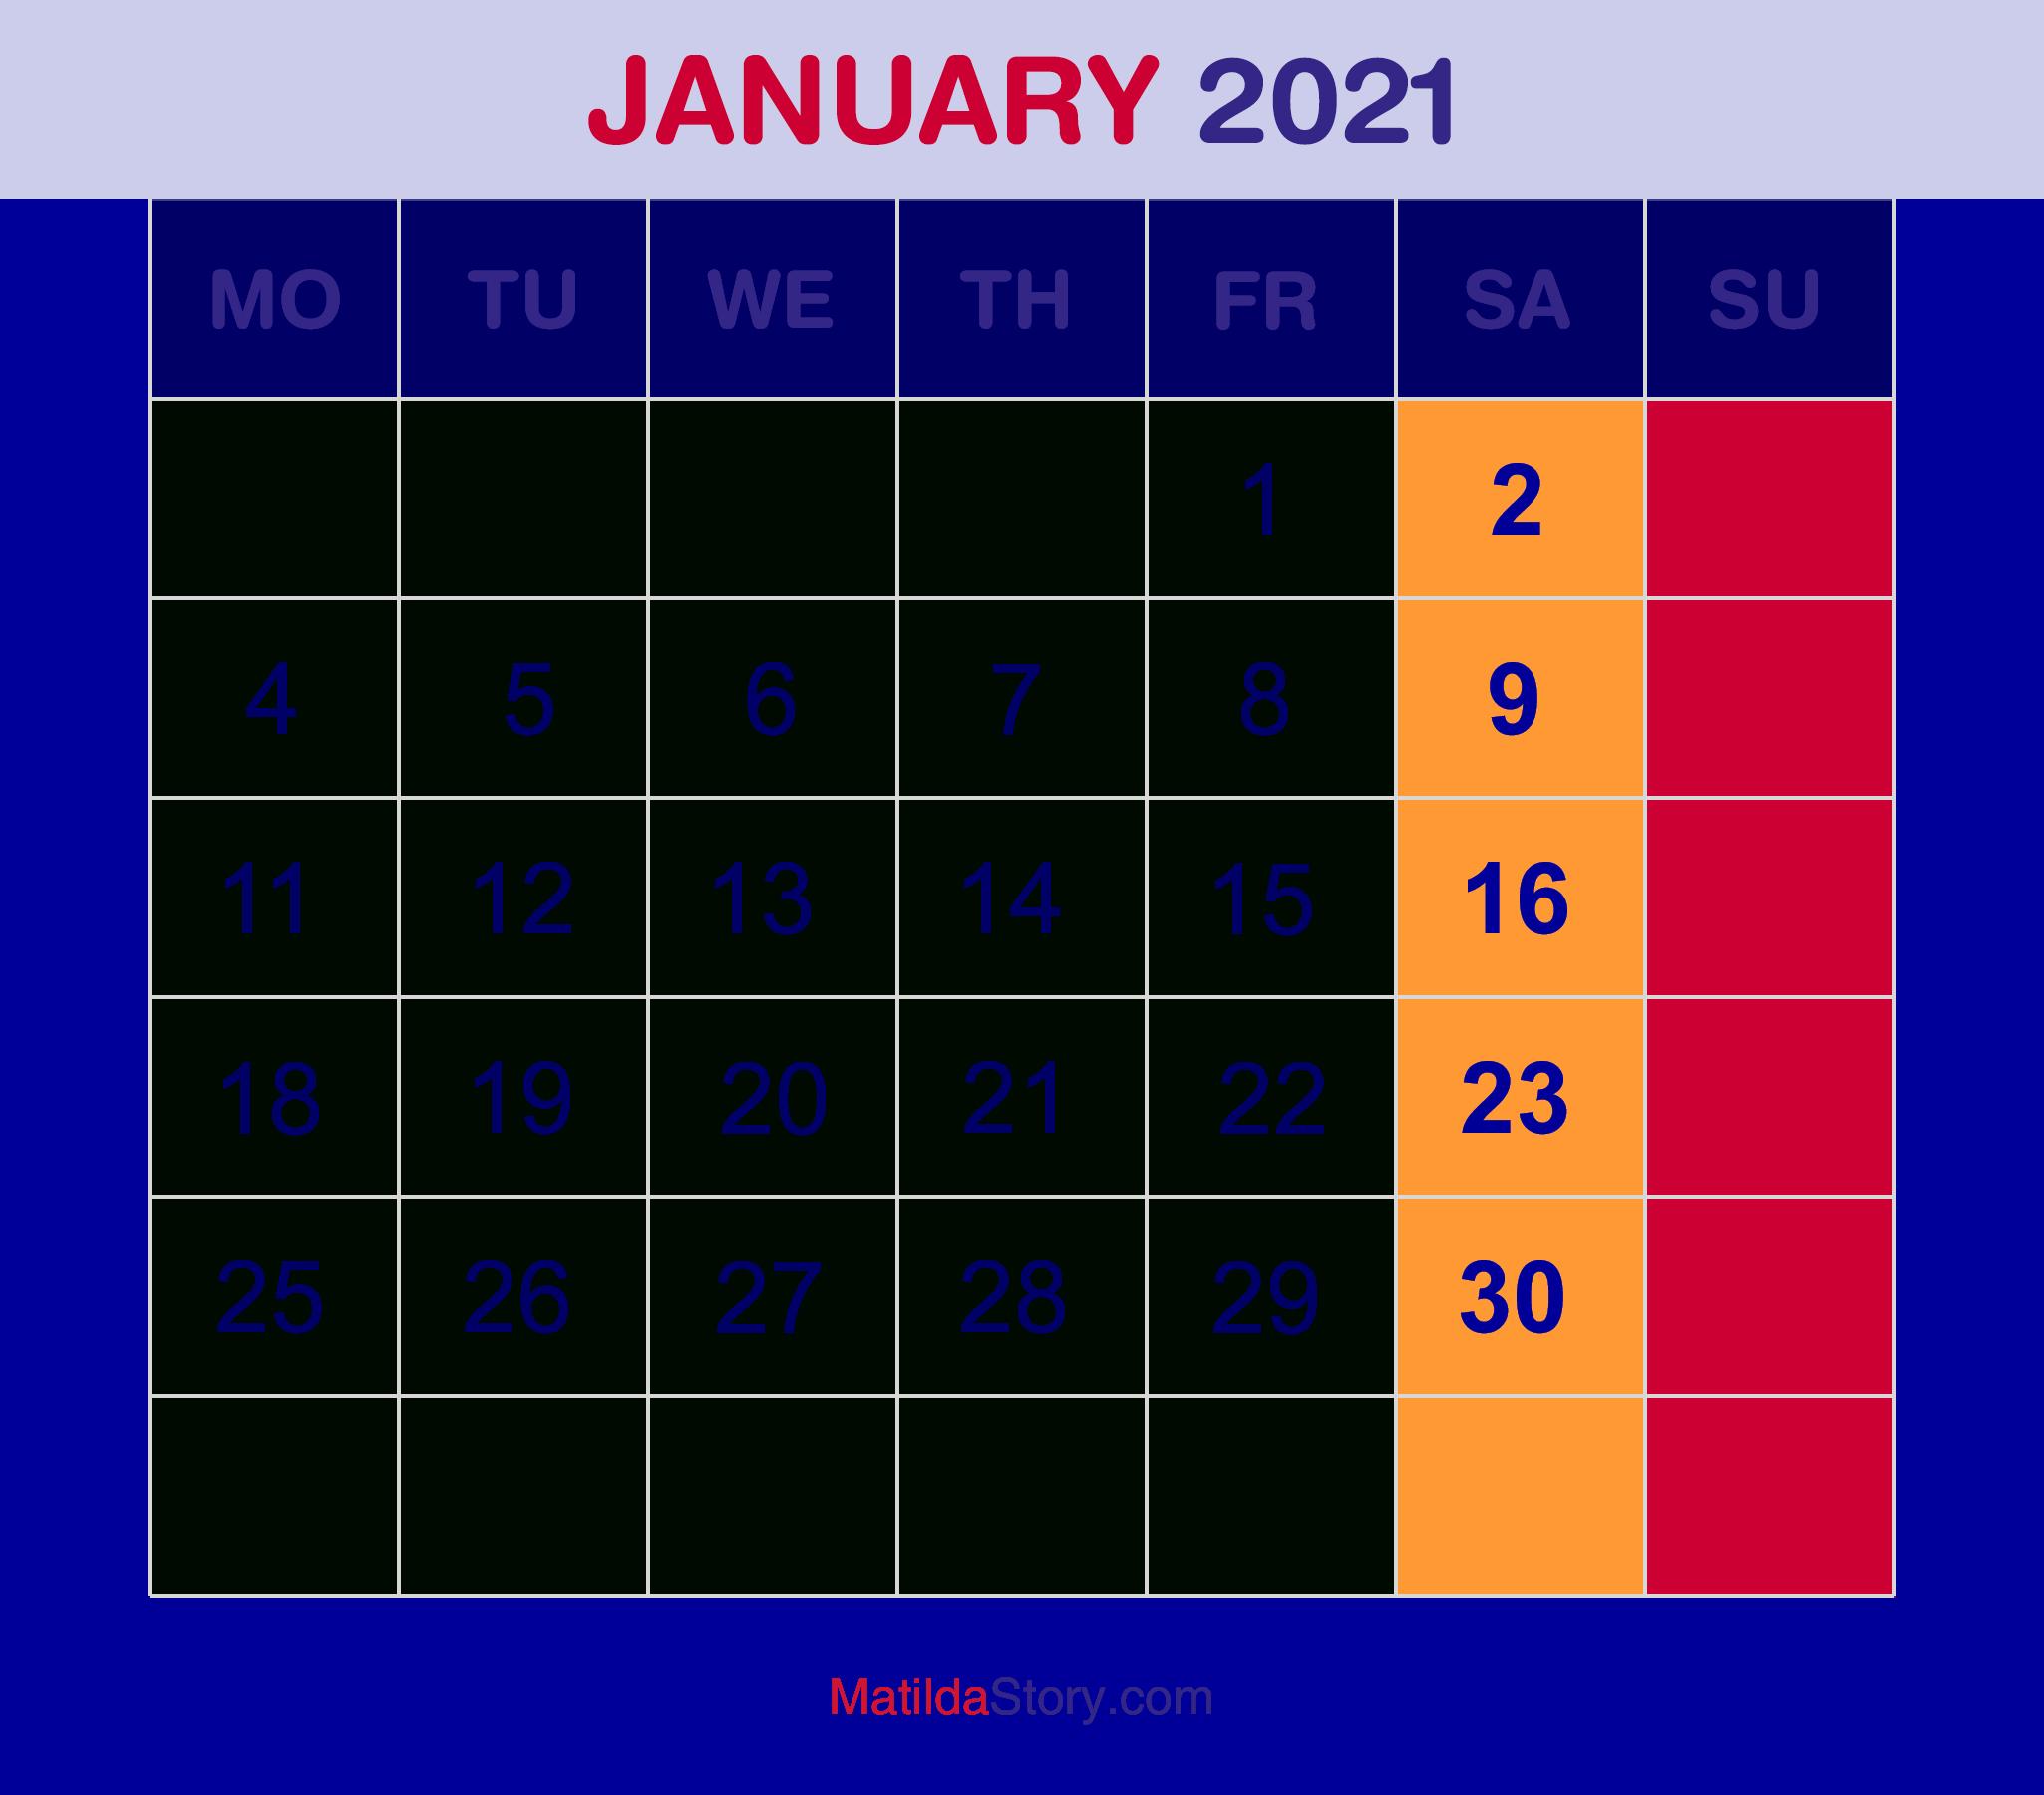 Download Calendar January 2021 : 65+ Printable Calendar January 2021 Holidays Portrait